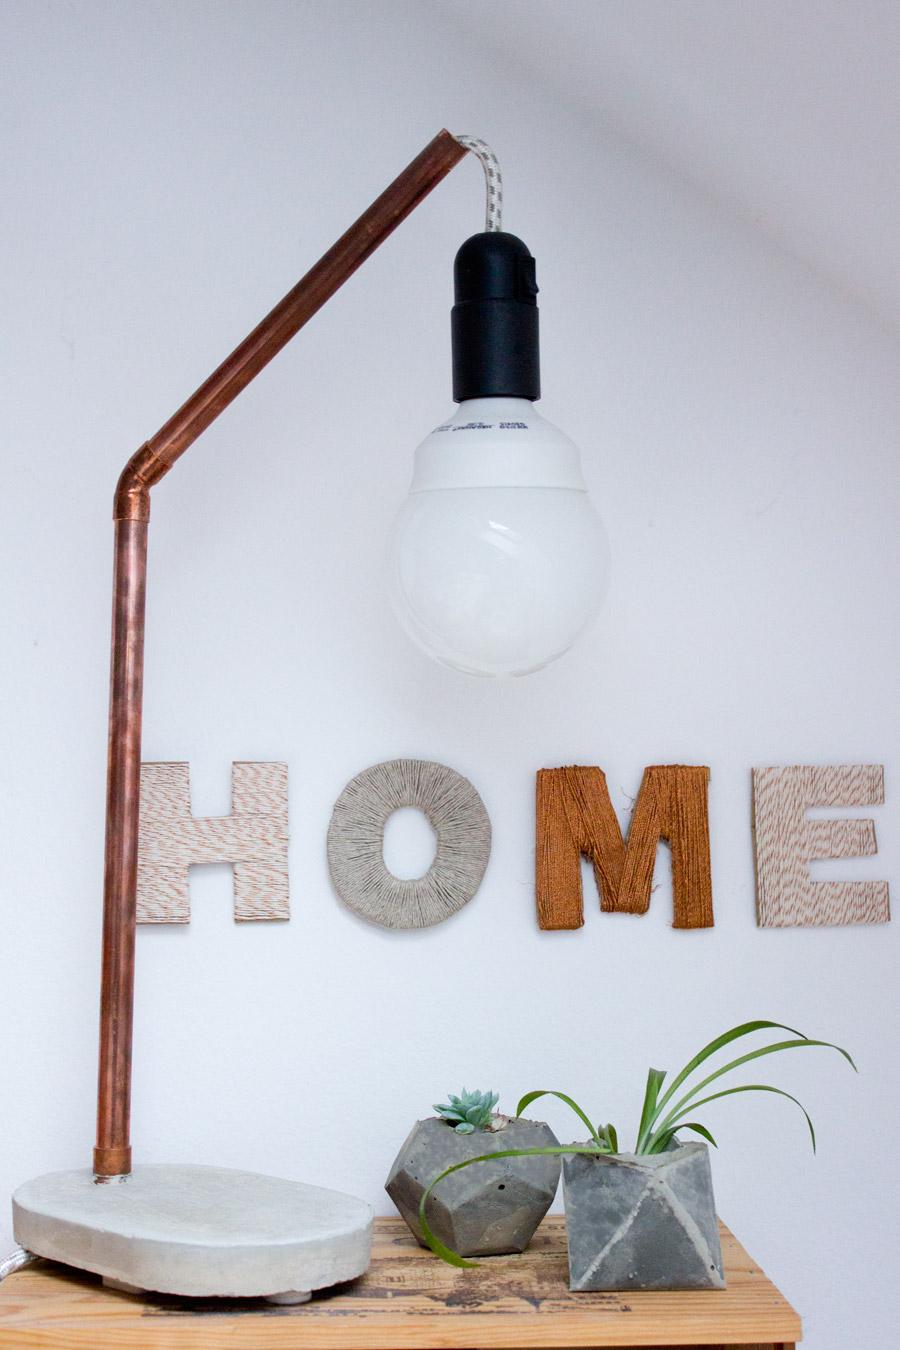 DIY thread letters DIY project idea wall decor